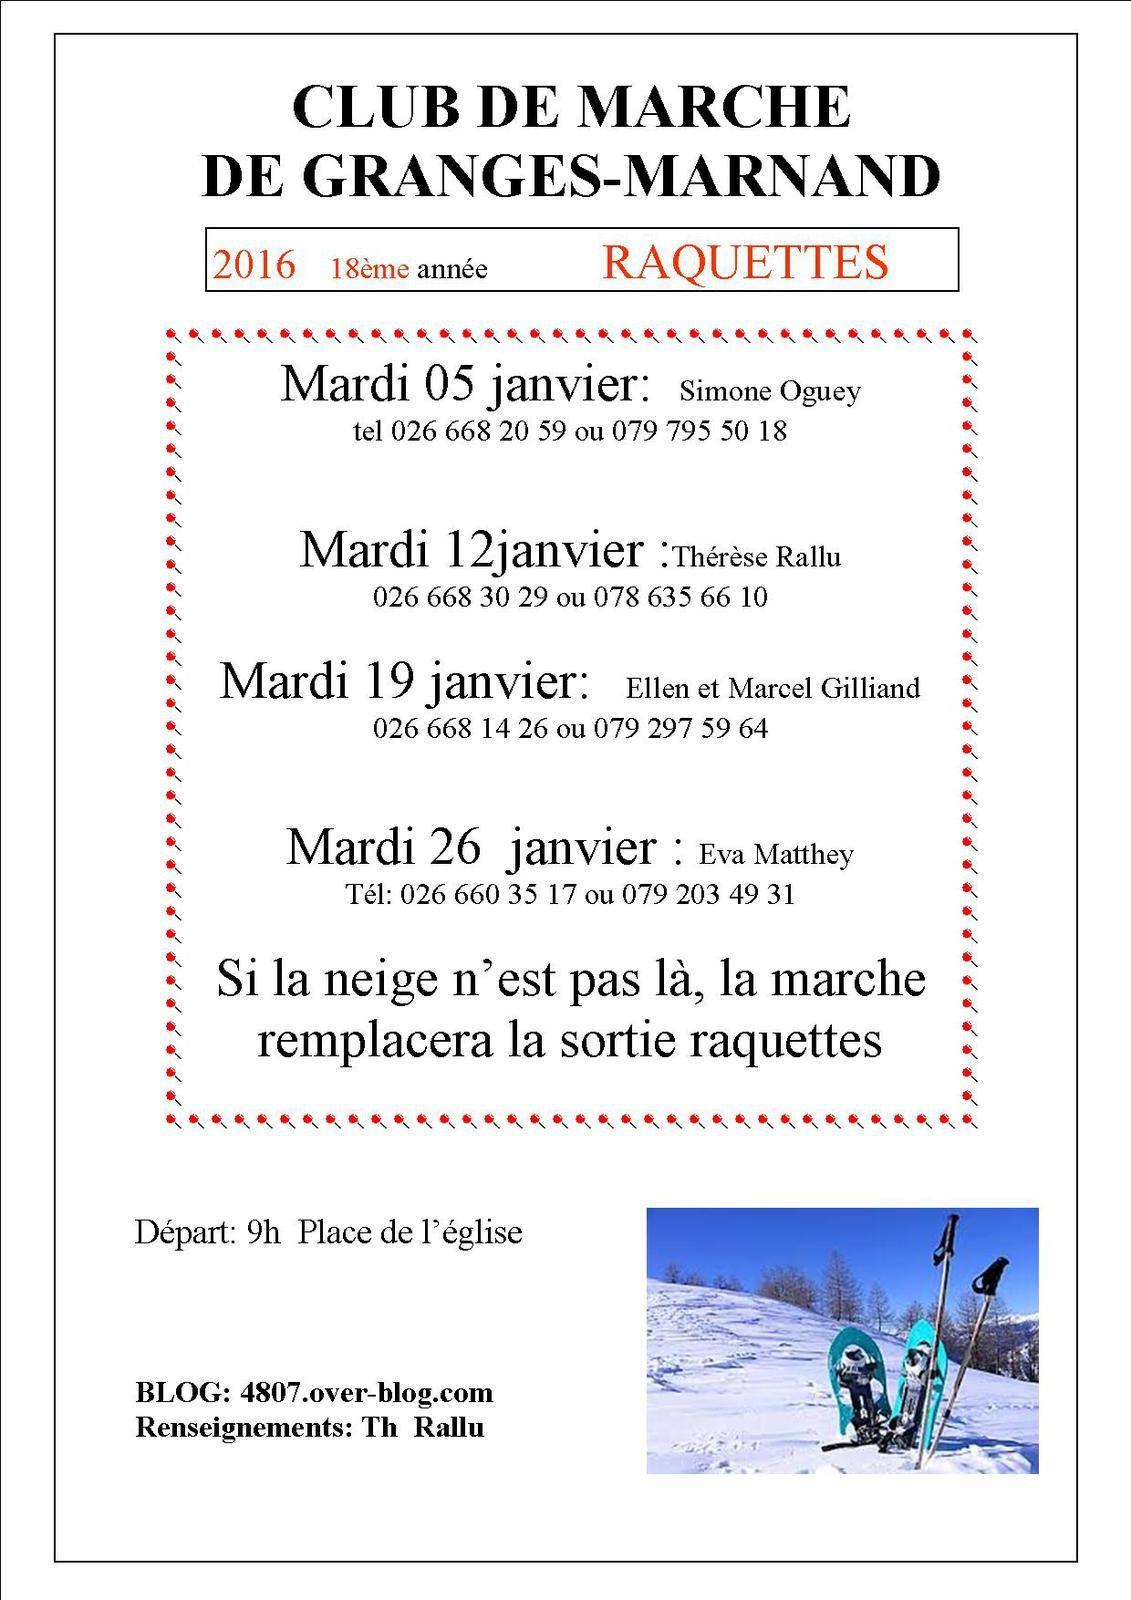 janvier 2016: raquettes